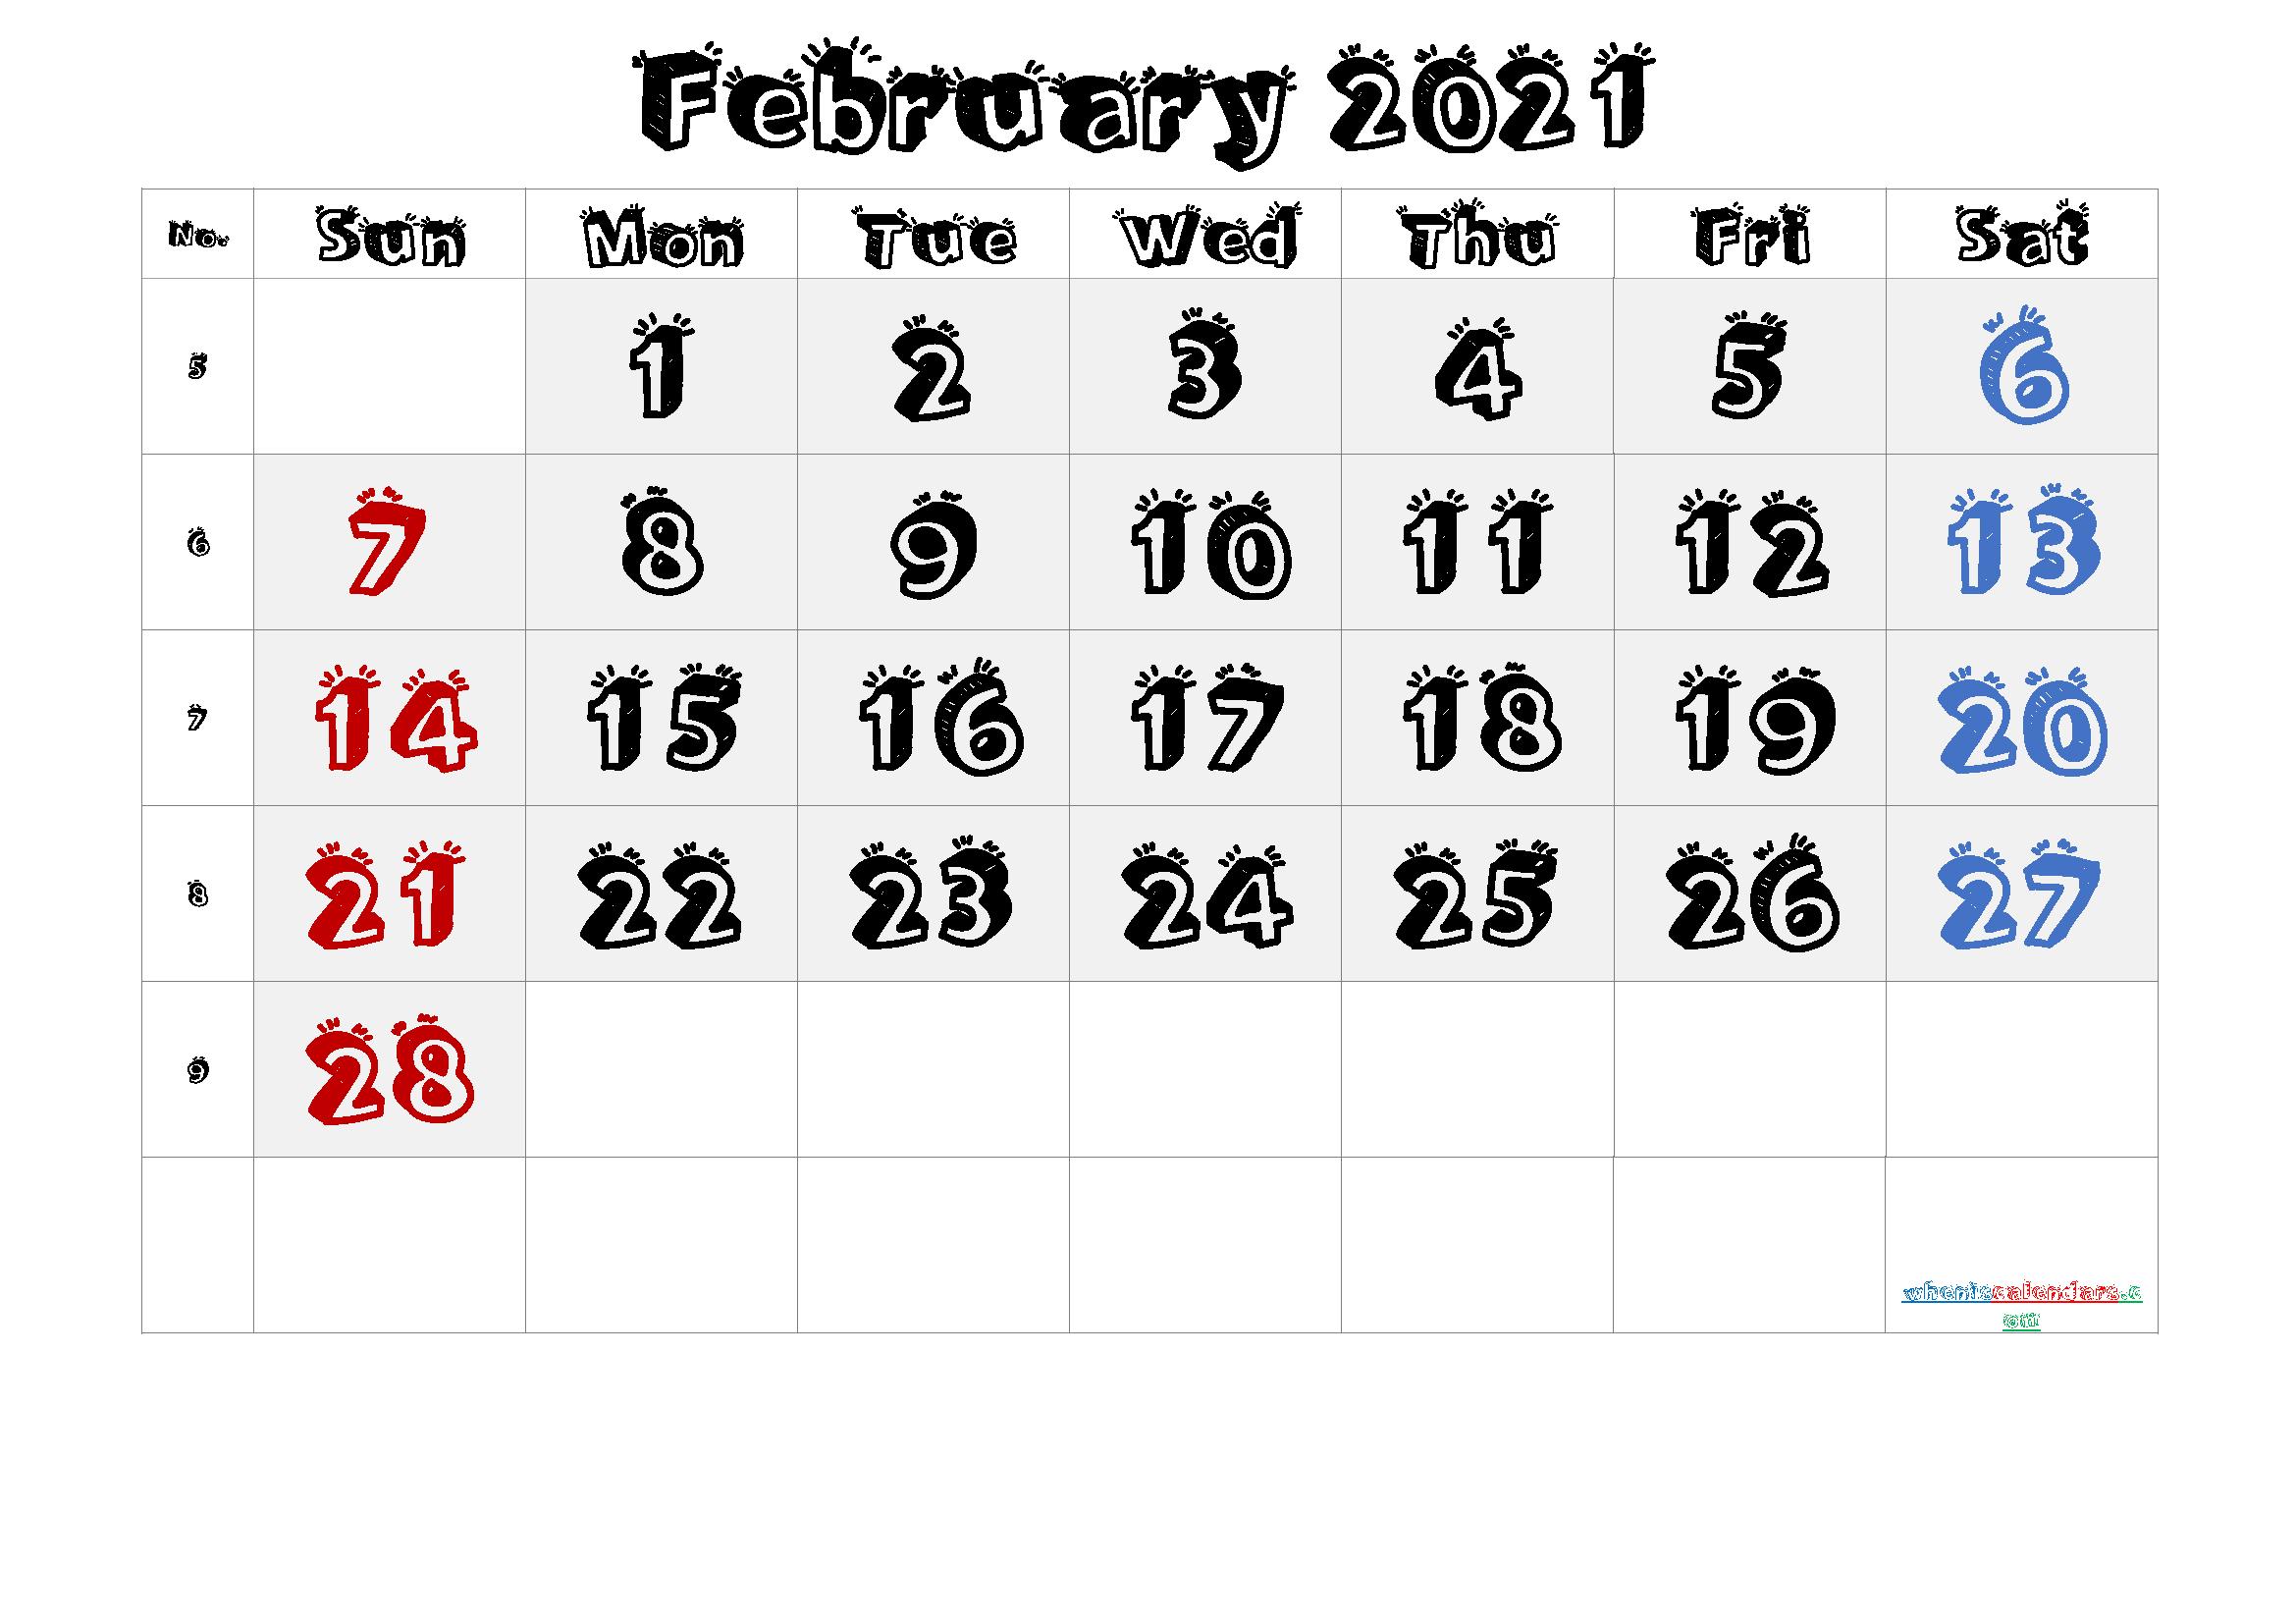 2021 February Free Printable Calendar